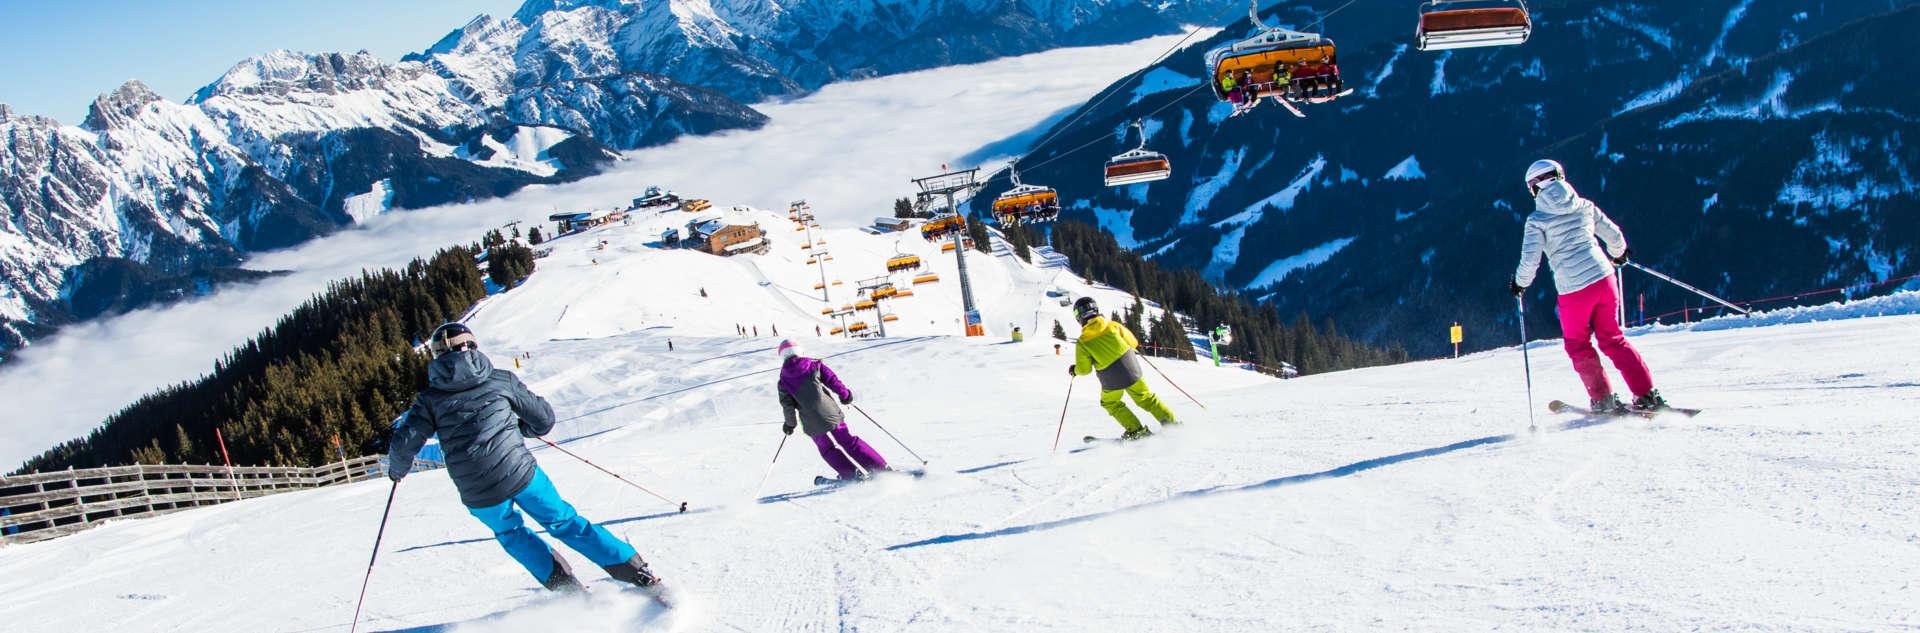 Skidresor Till Saalbach Boka Din Skidresa Hos Sts Alpresor